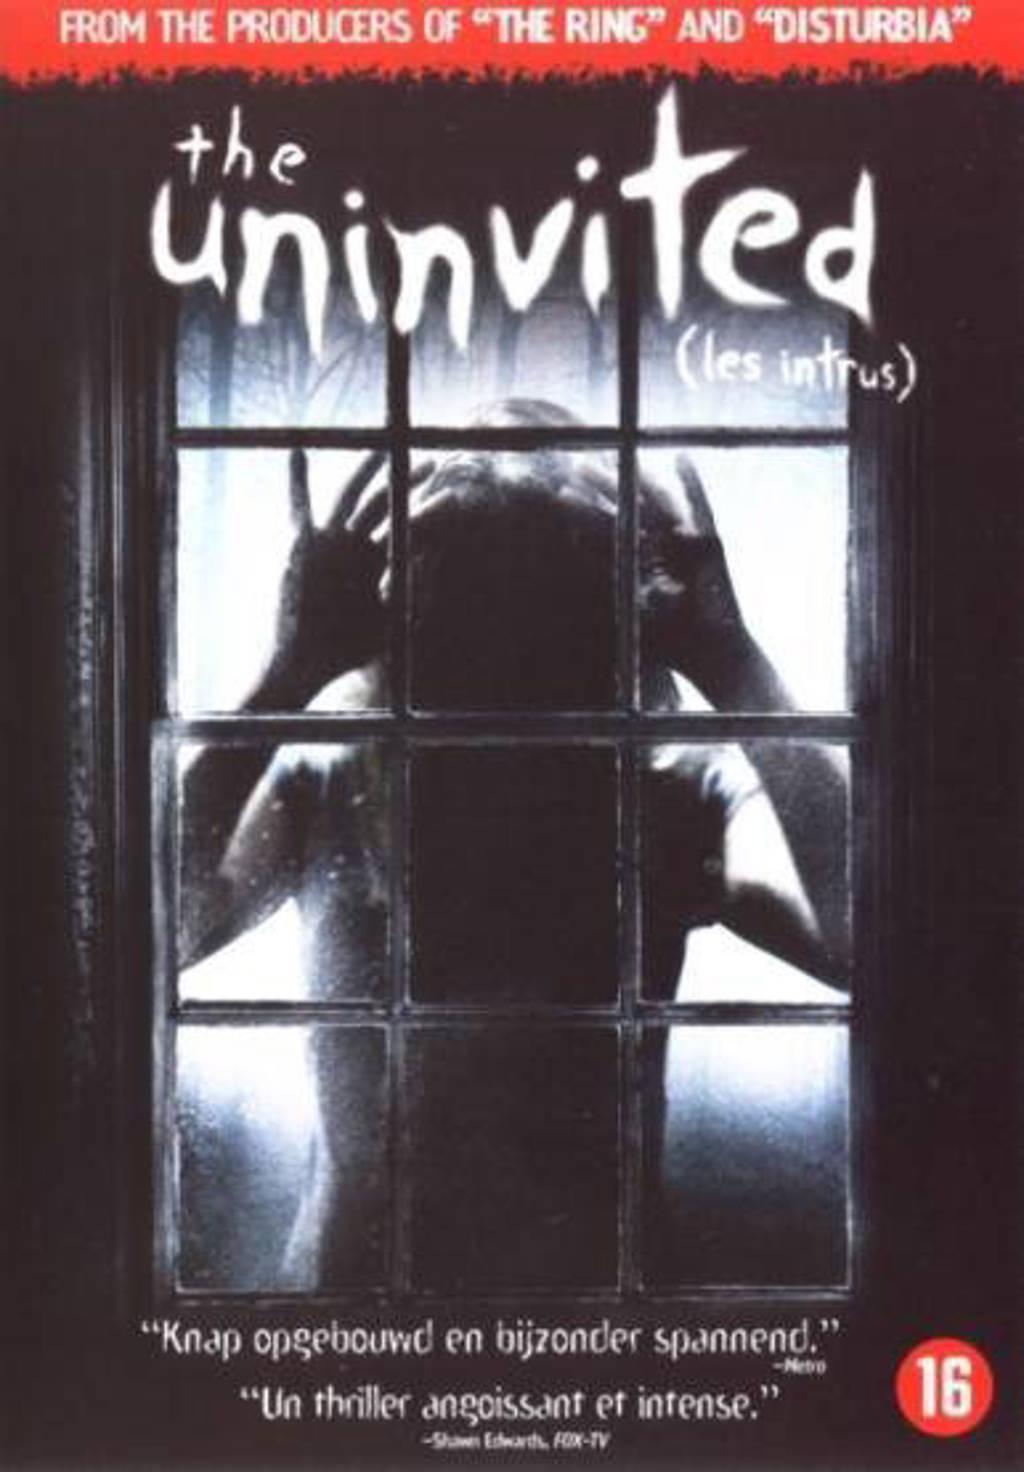 Uninvited (DVD)